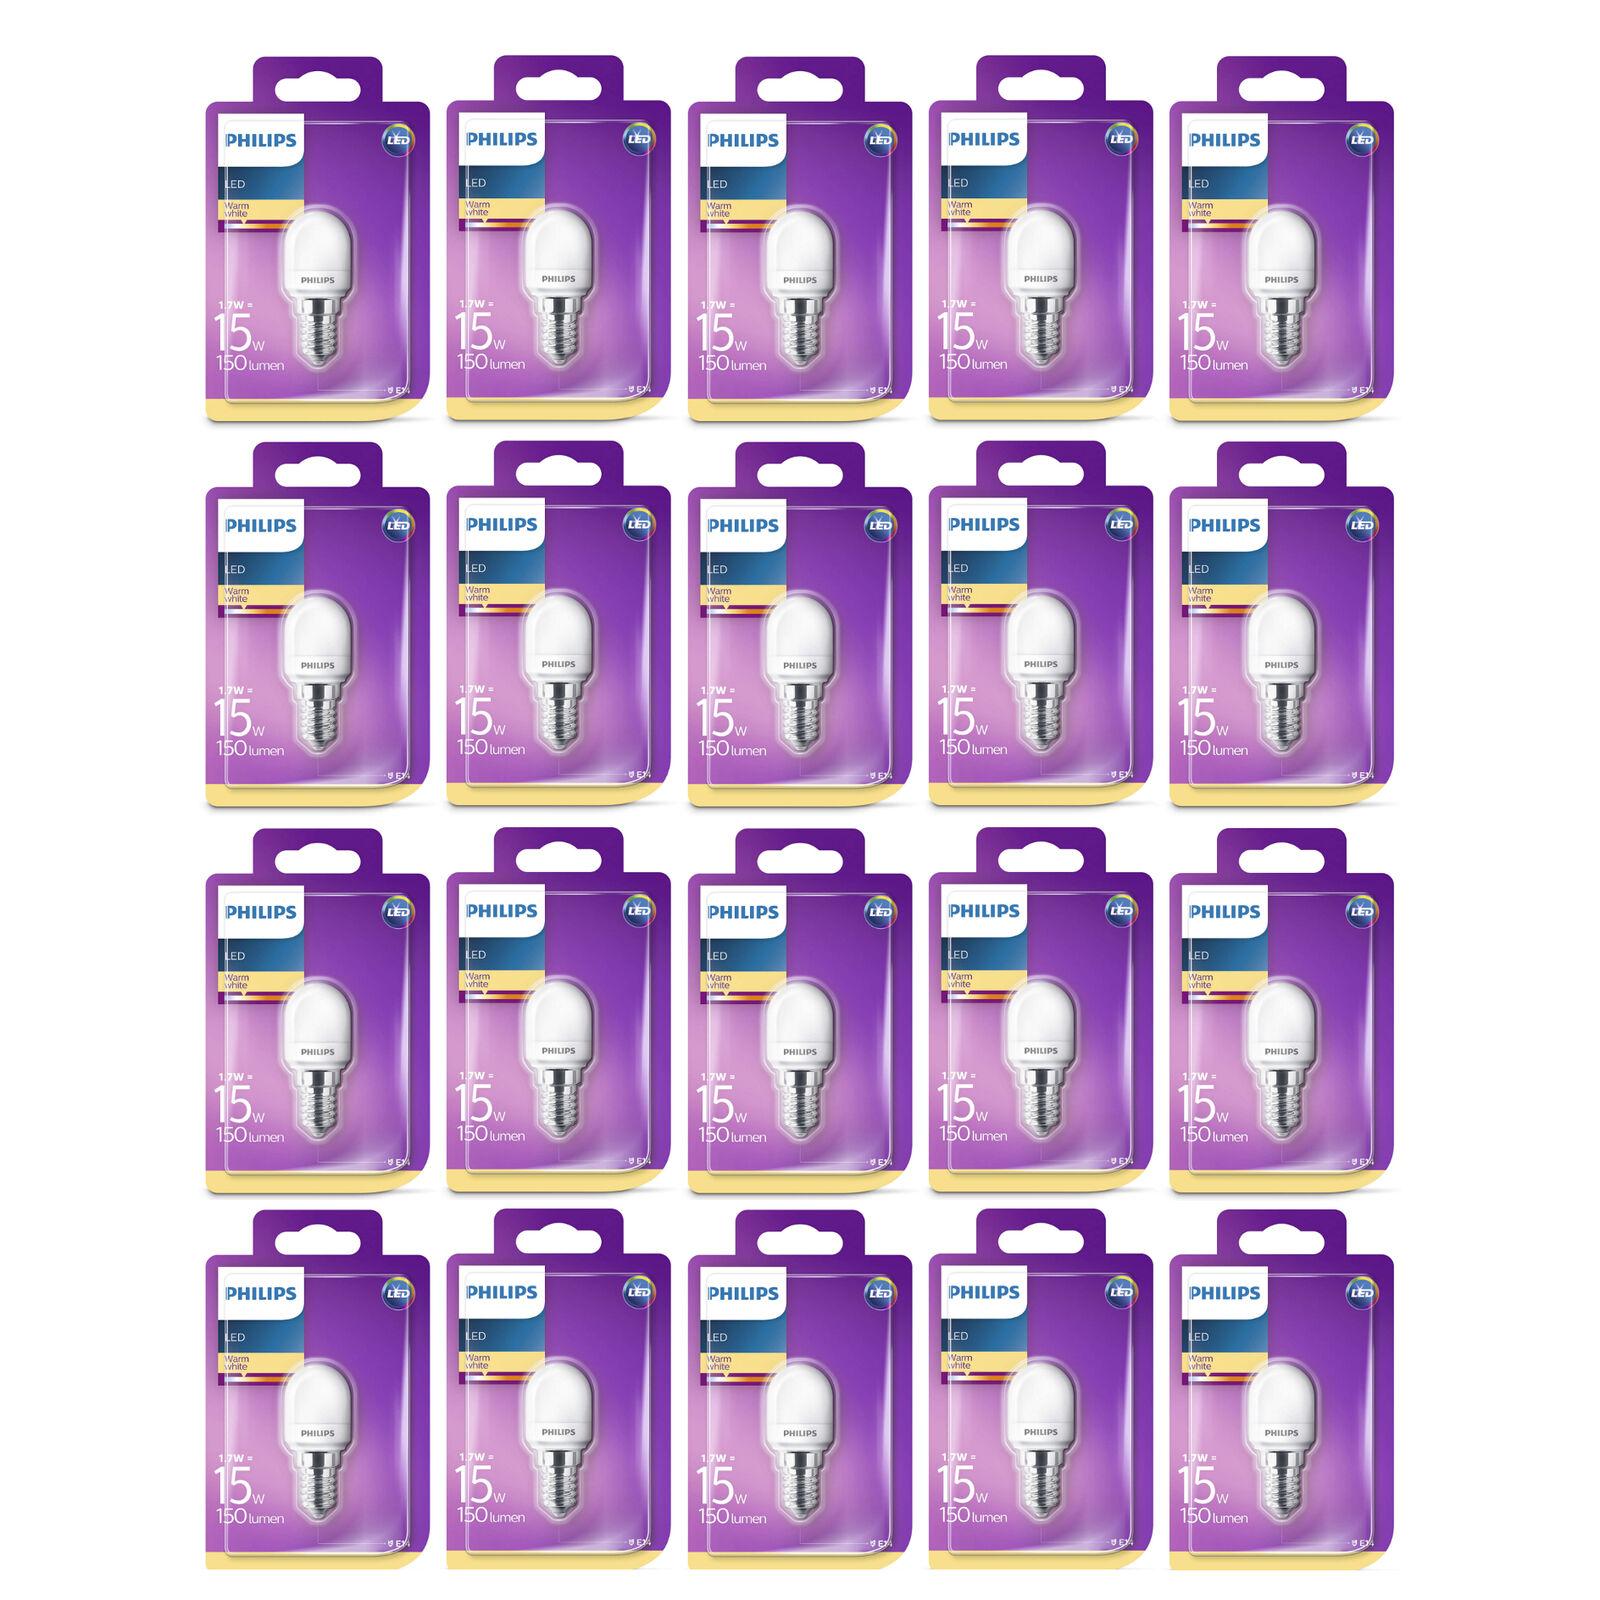 60 x Philips LED T25 Frosted E14 Edison 15W Appliance Fridge Light Bulbs 150Lm